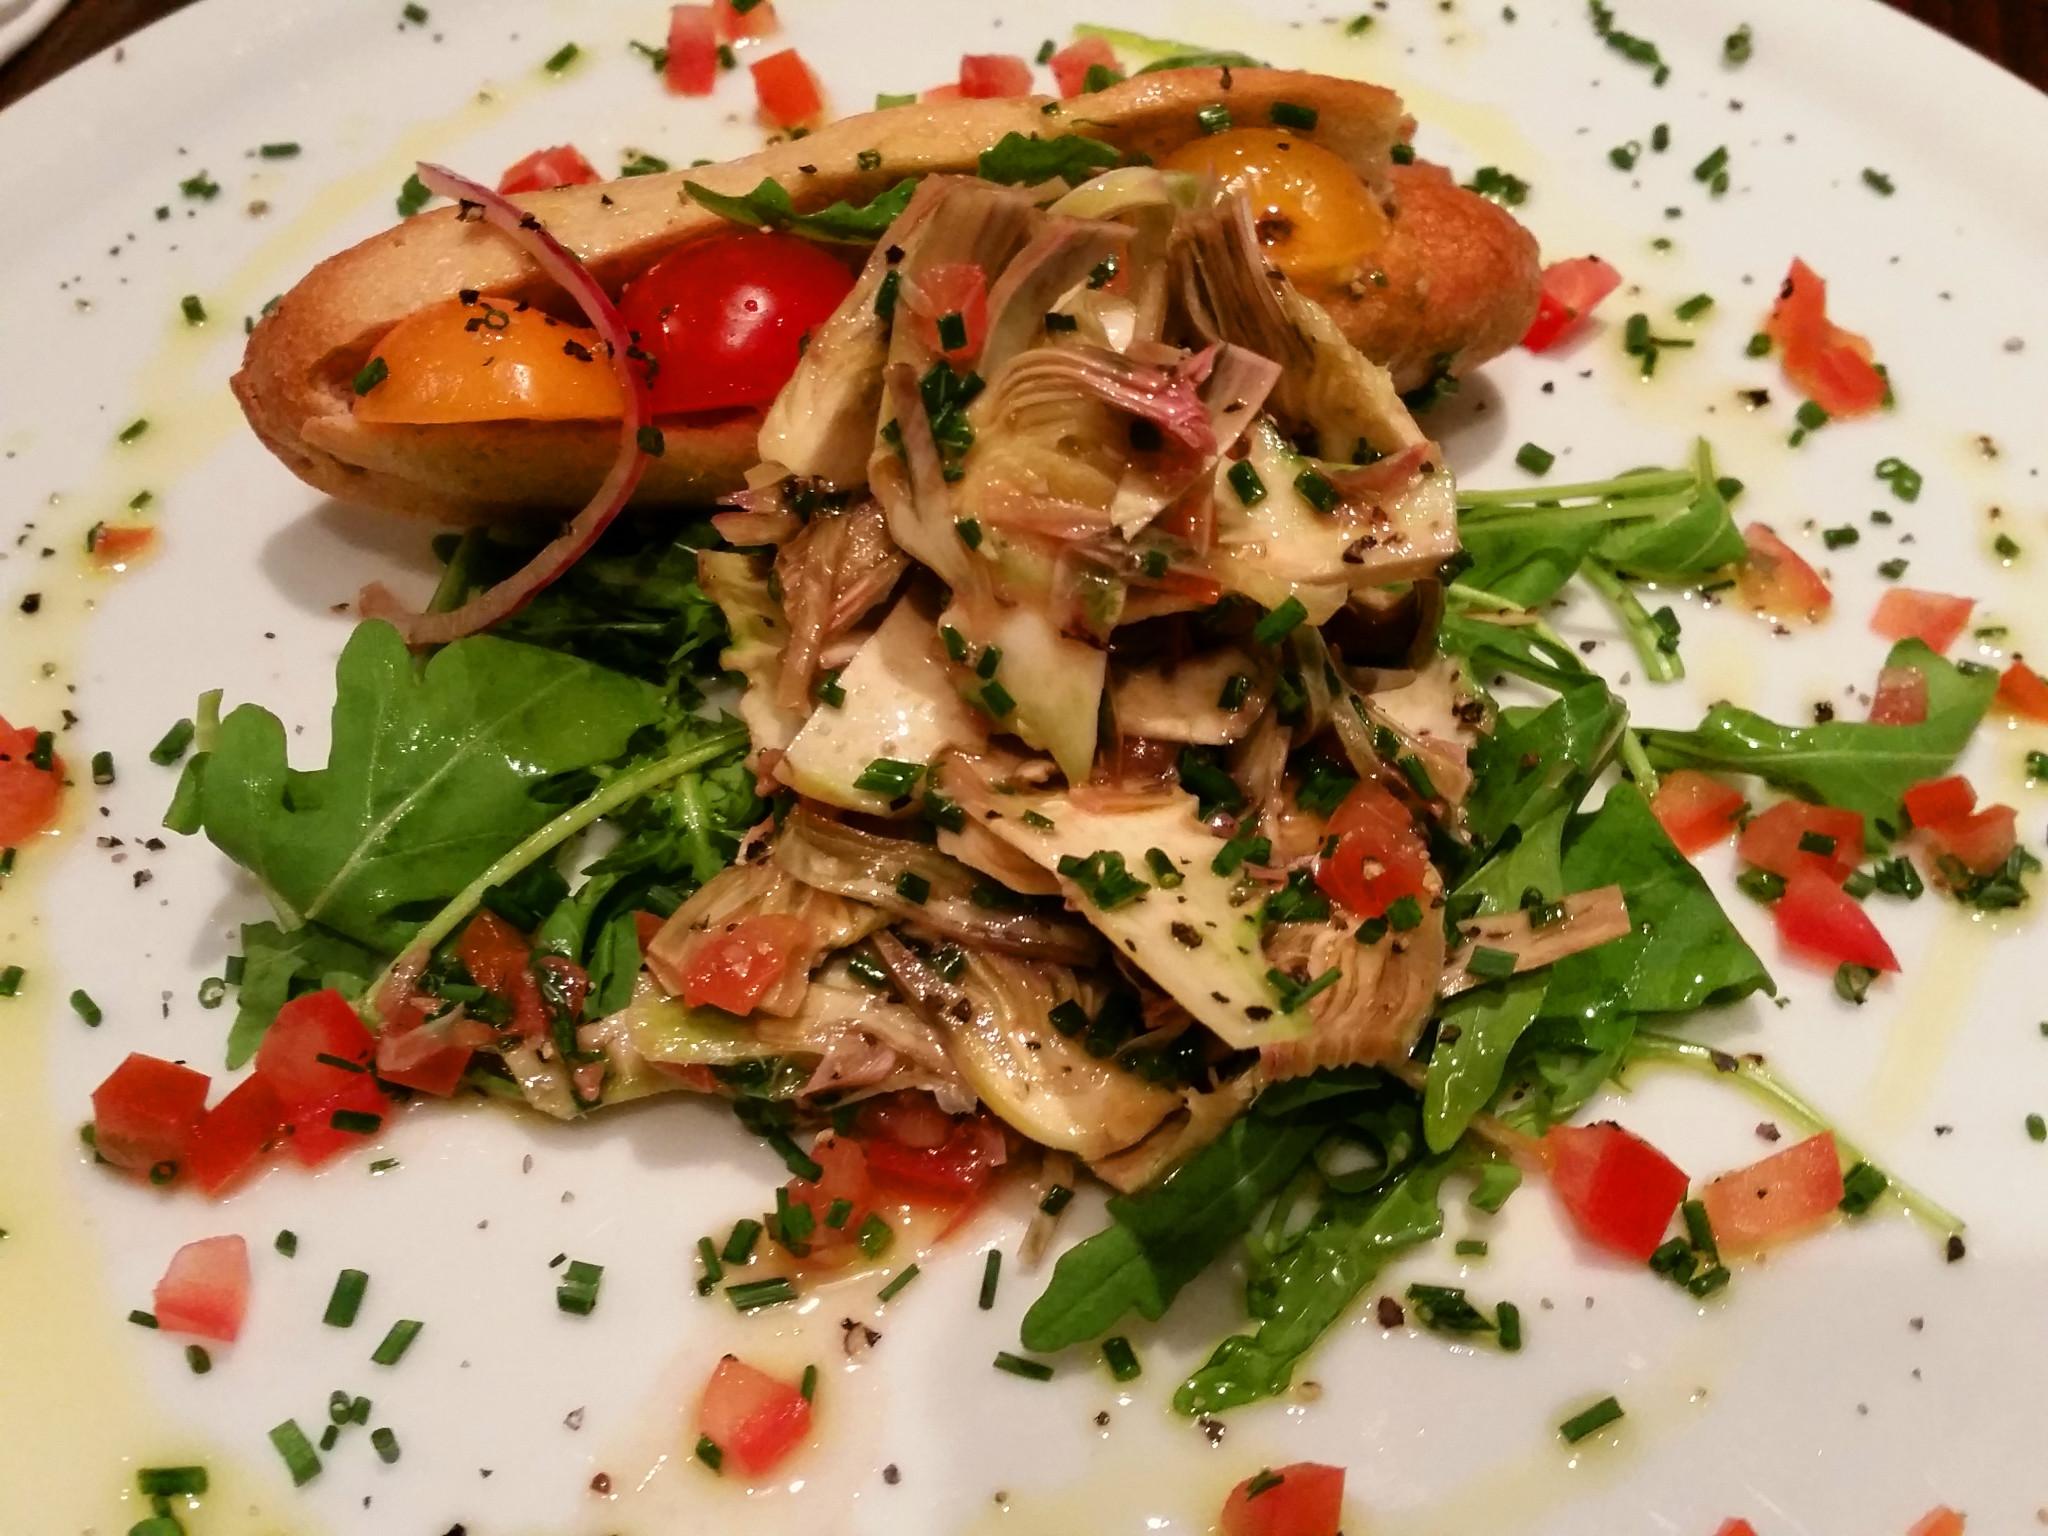 Bistrot Chaud-Vin salad